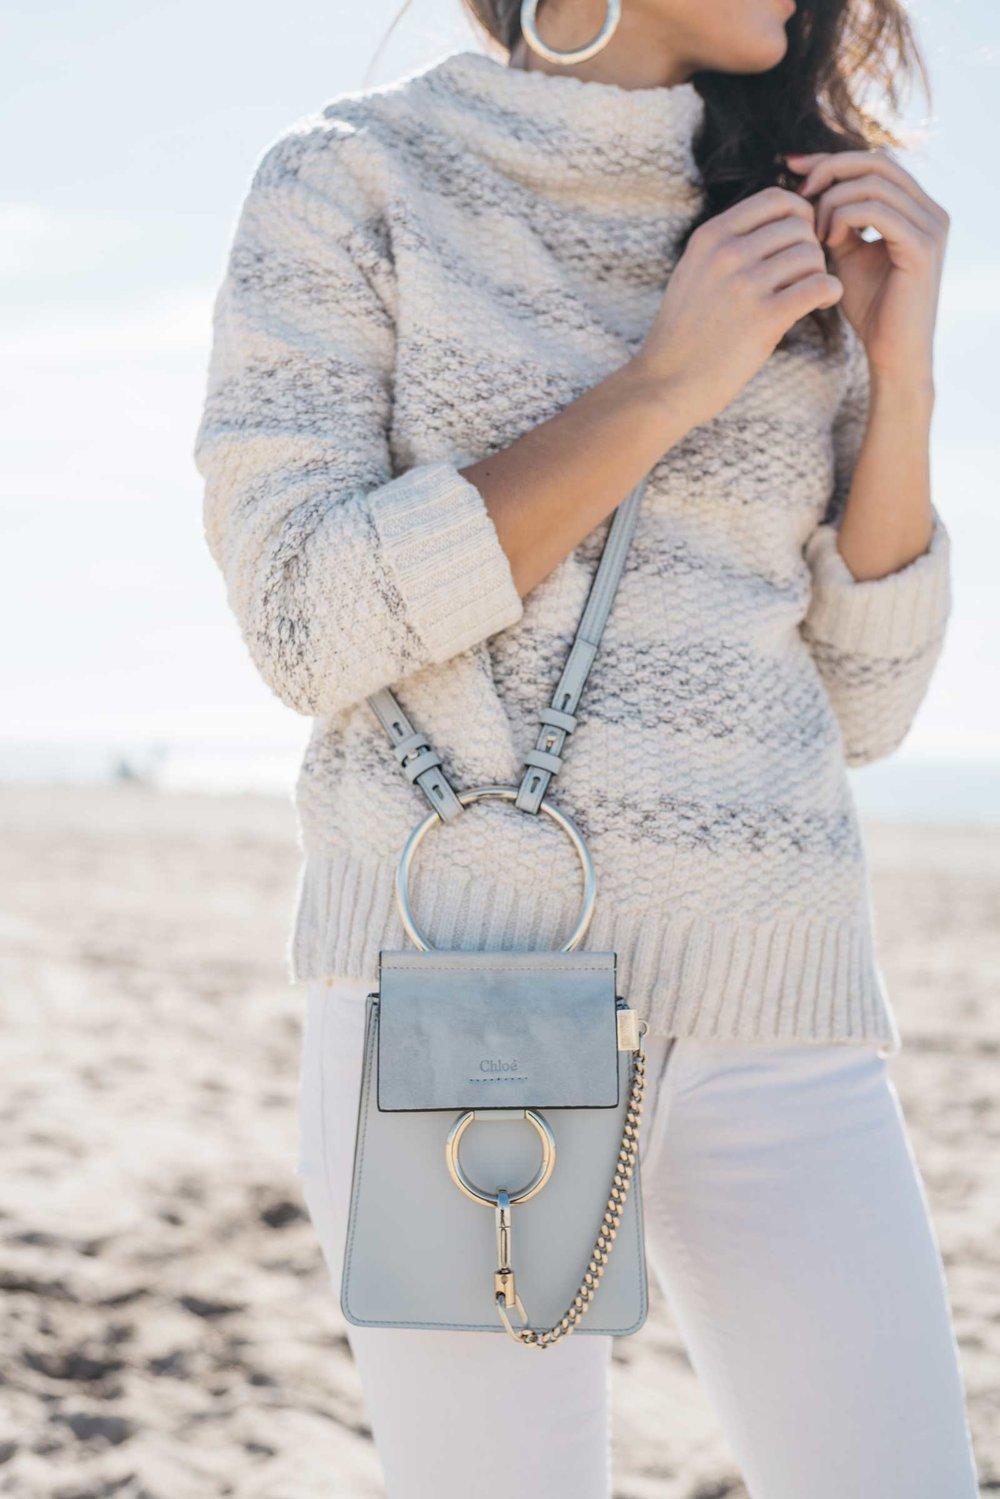 O'Neill-Livie-Striped-Mock-Neck-Sweater-Chloe-Faye-Small-Leather-Bracelet-Bag-Ray-Ban-53mm-Retro-Sunglasses-4.jpg